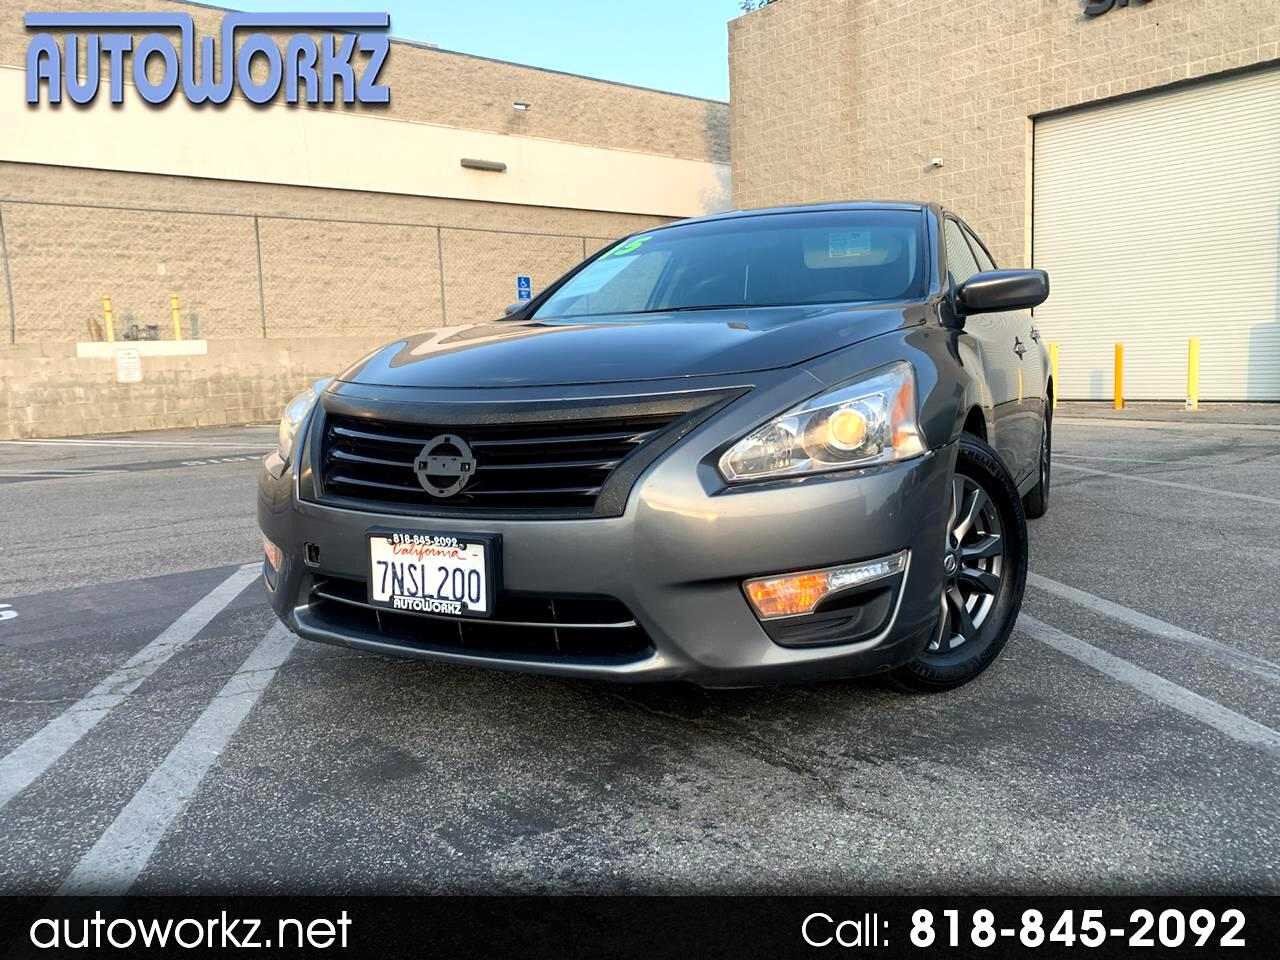 Nissan Altima 4dr Sdn I4 2.5 S 2015